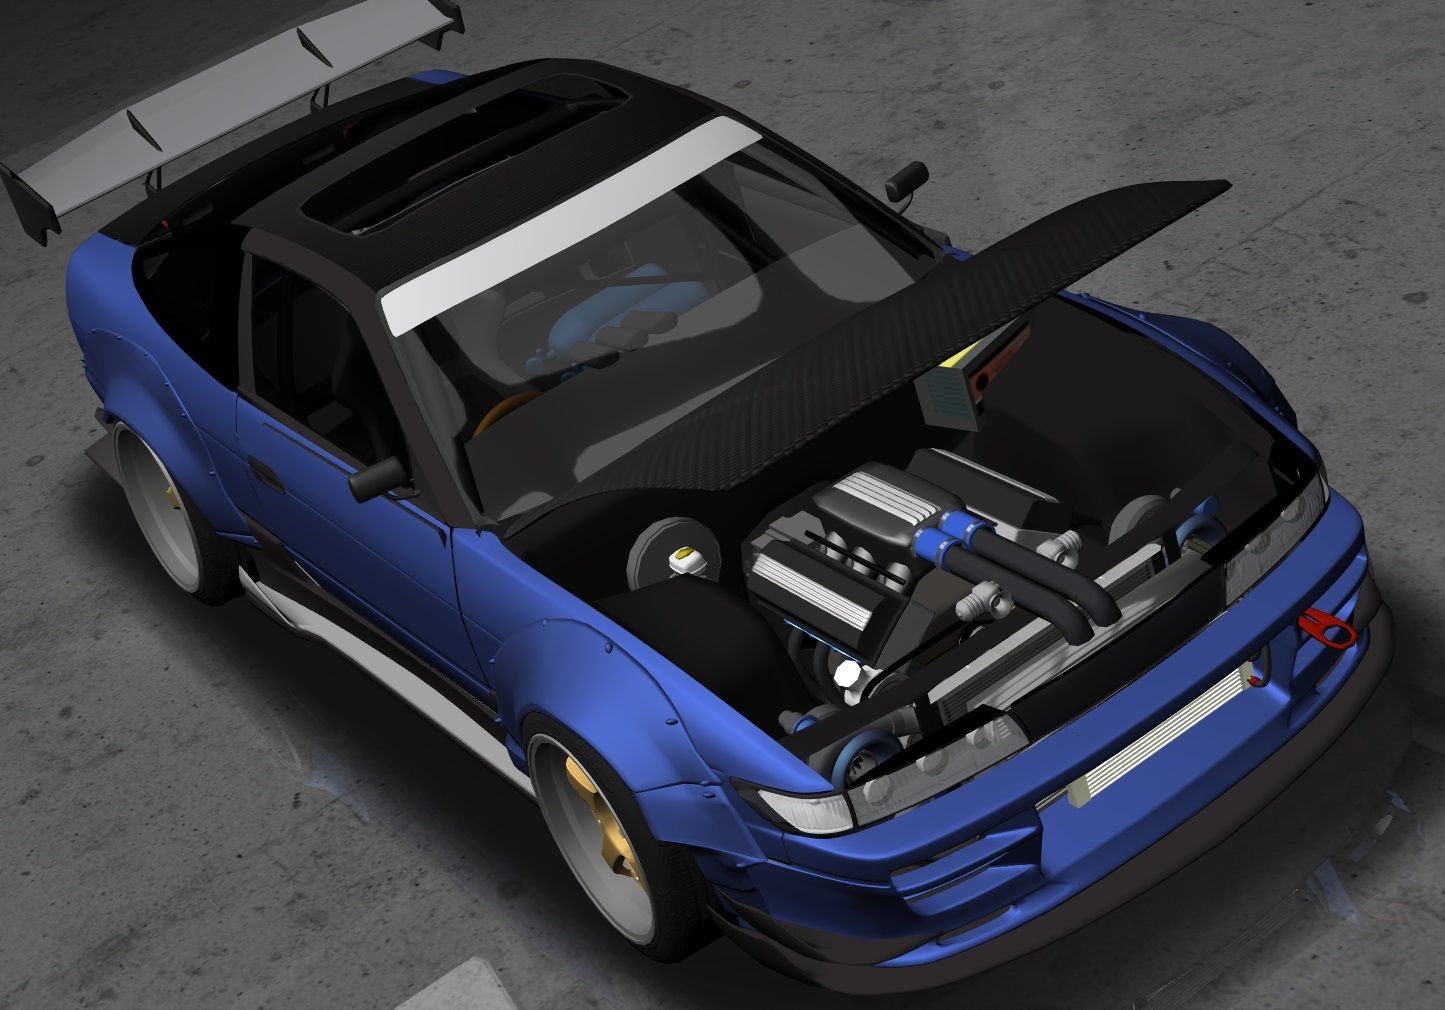 S Tuner Project (Nissan 240sx S13 Hatch) VG33DETT Custom